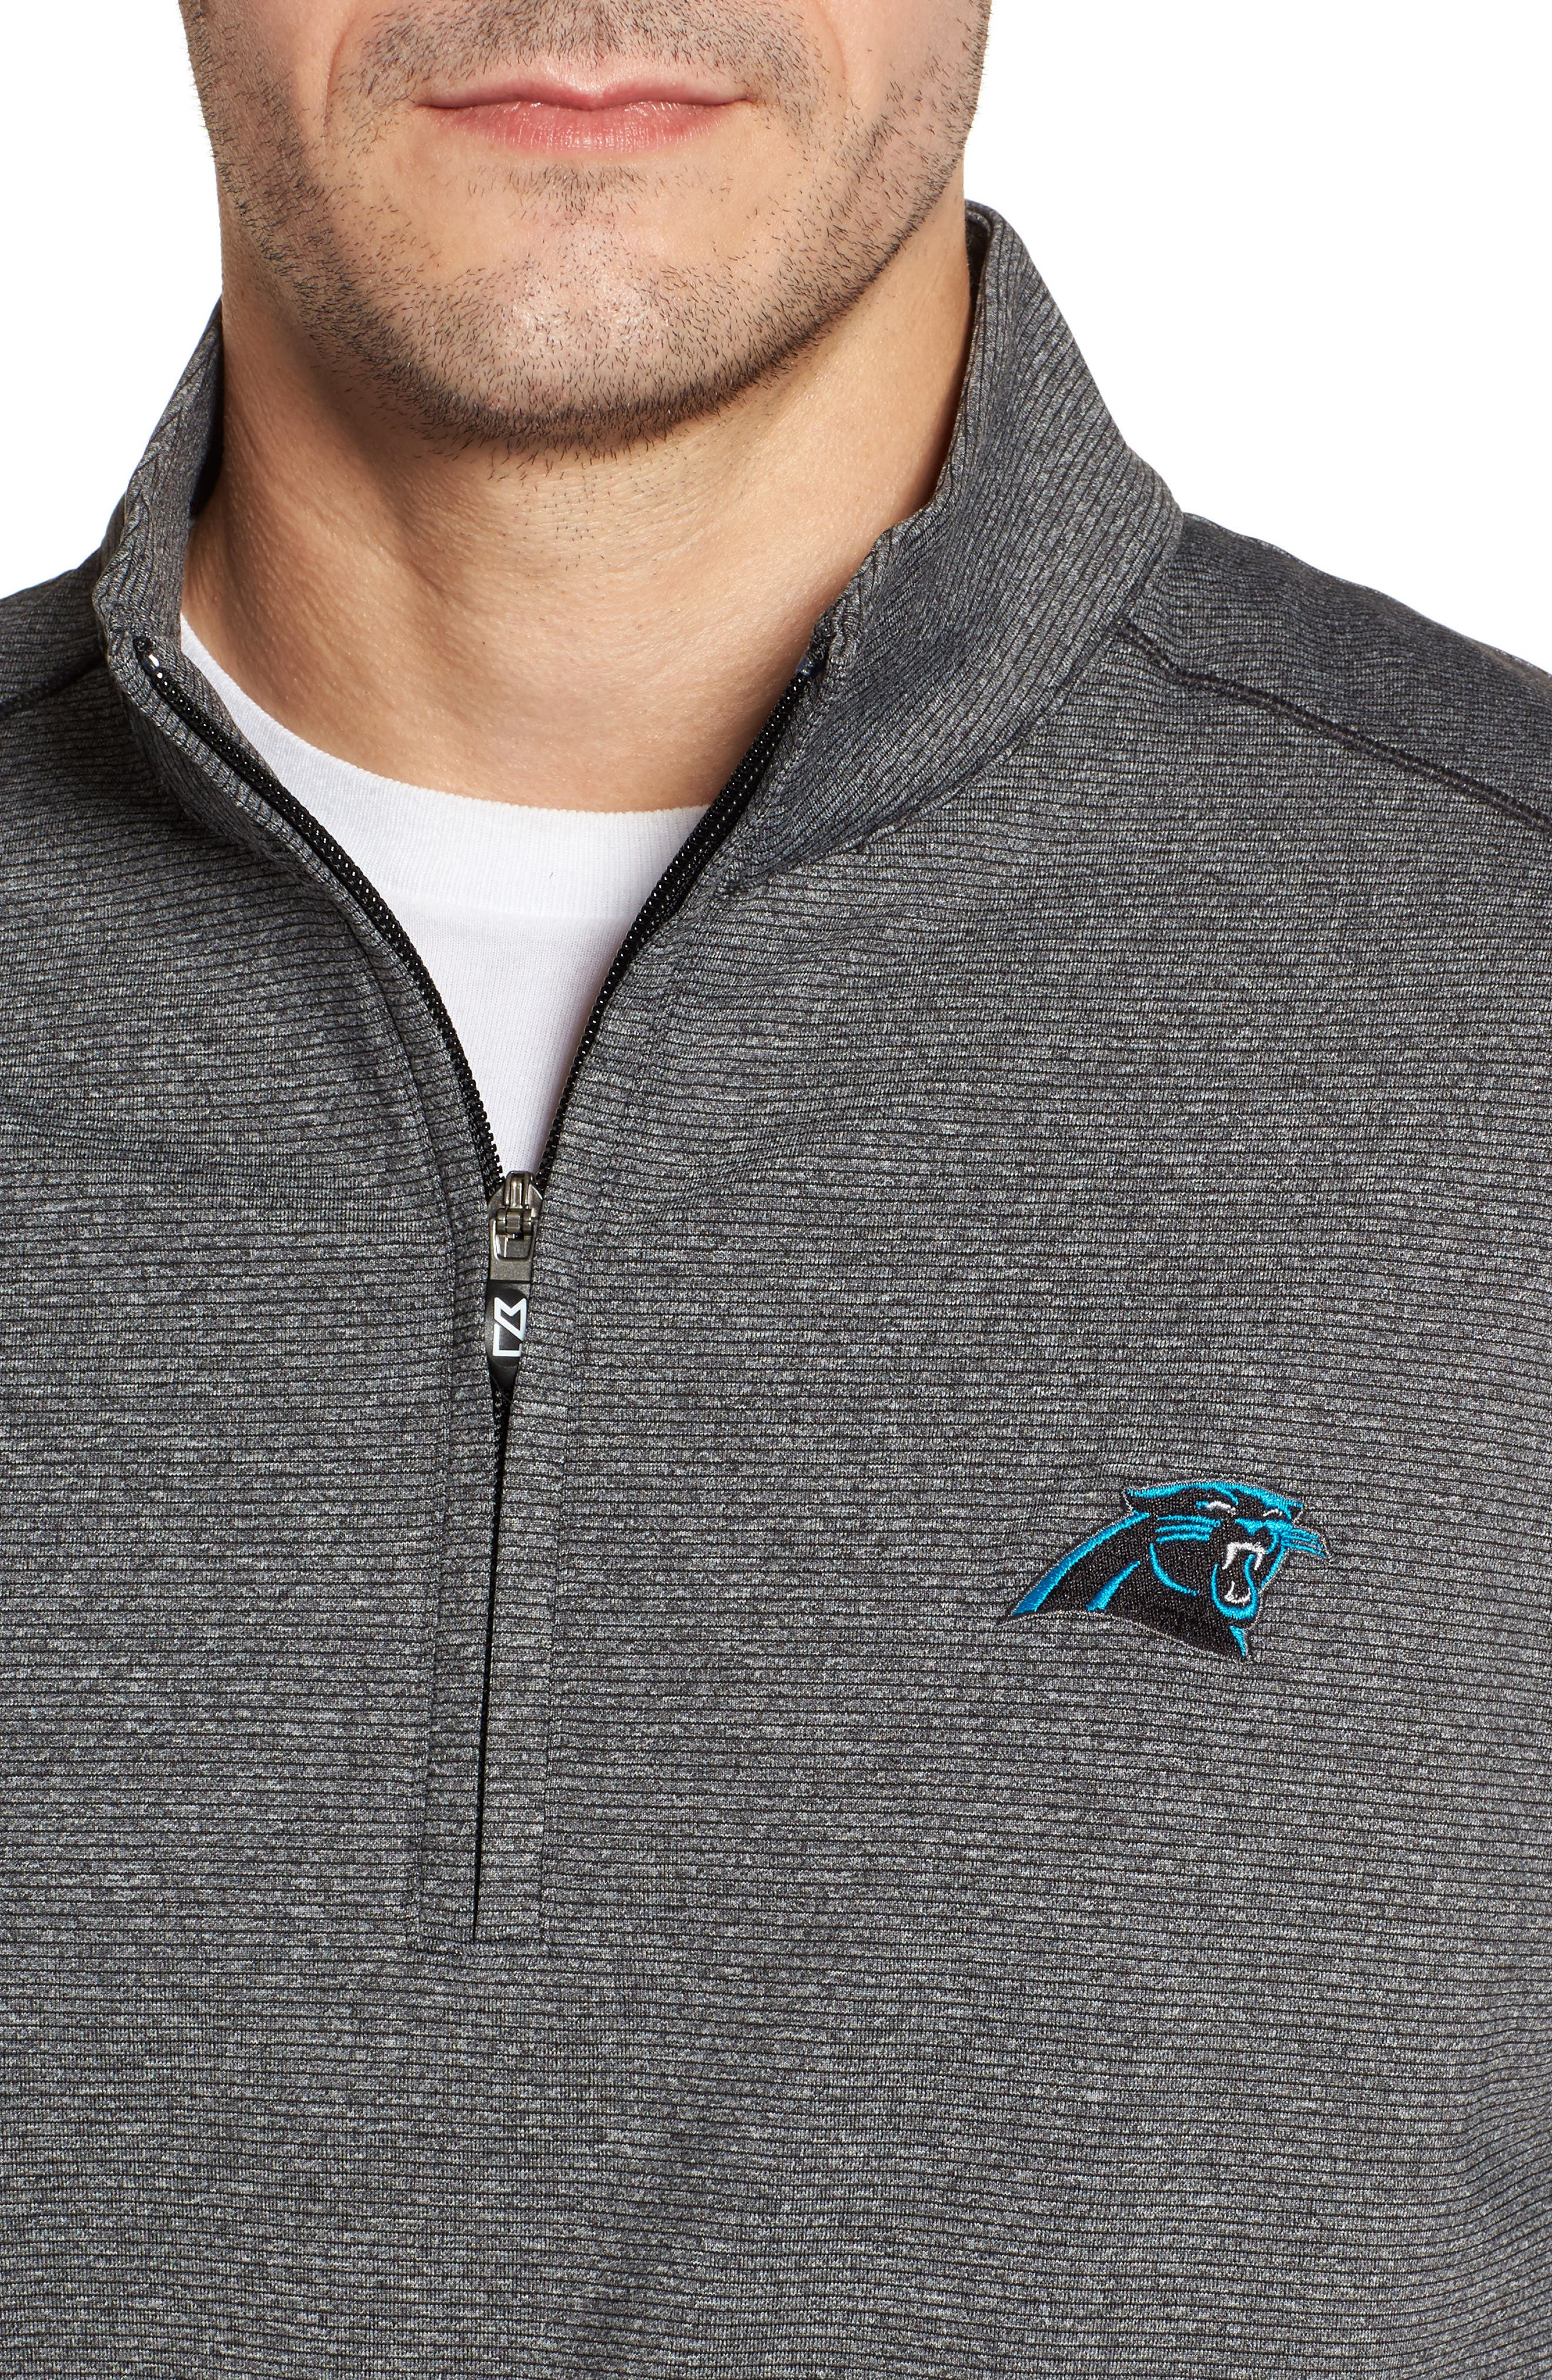 Shoreline - Carolina Panthers Half Zip Pullover,                             Alternate thumbnail 4, color,                             Charcoal Heather